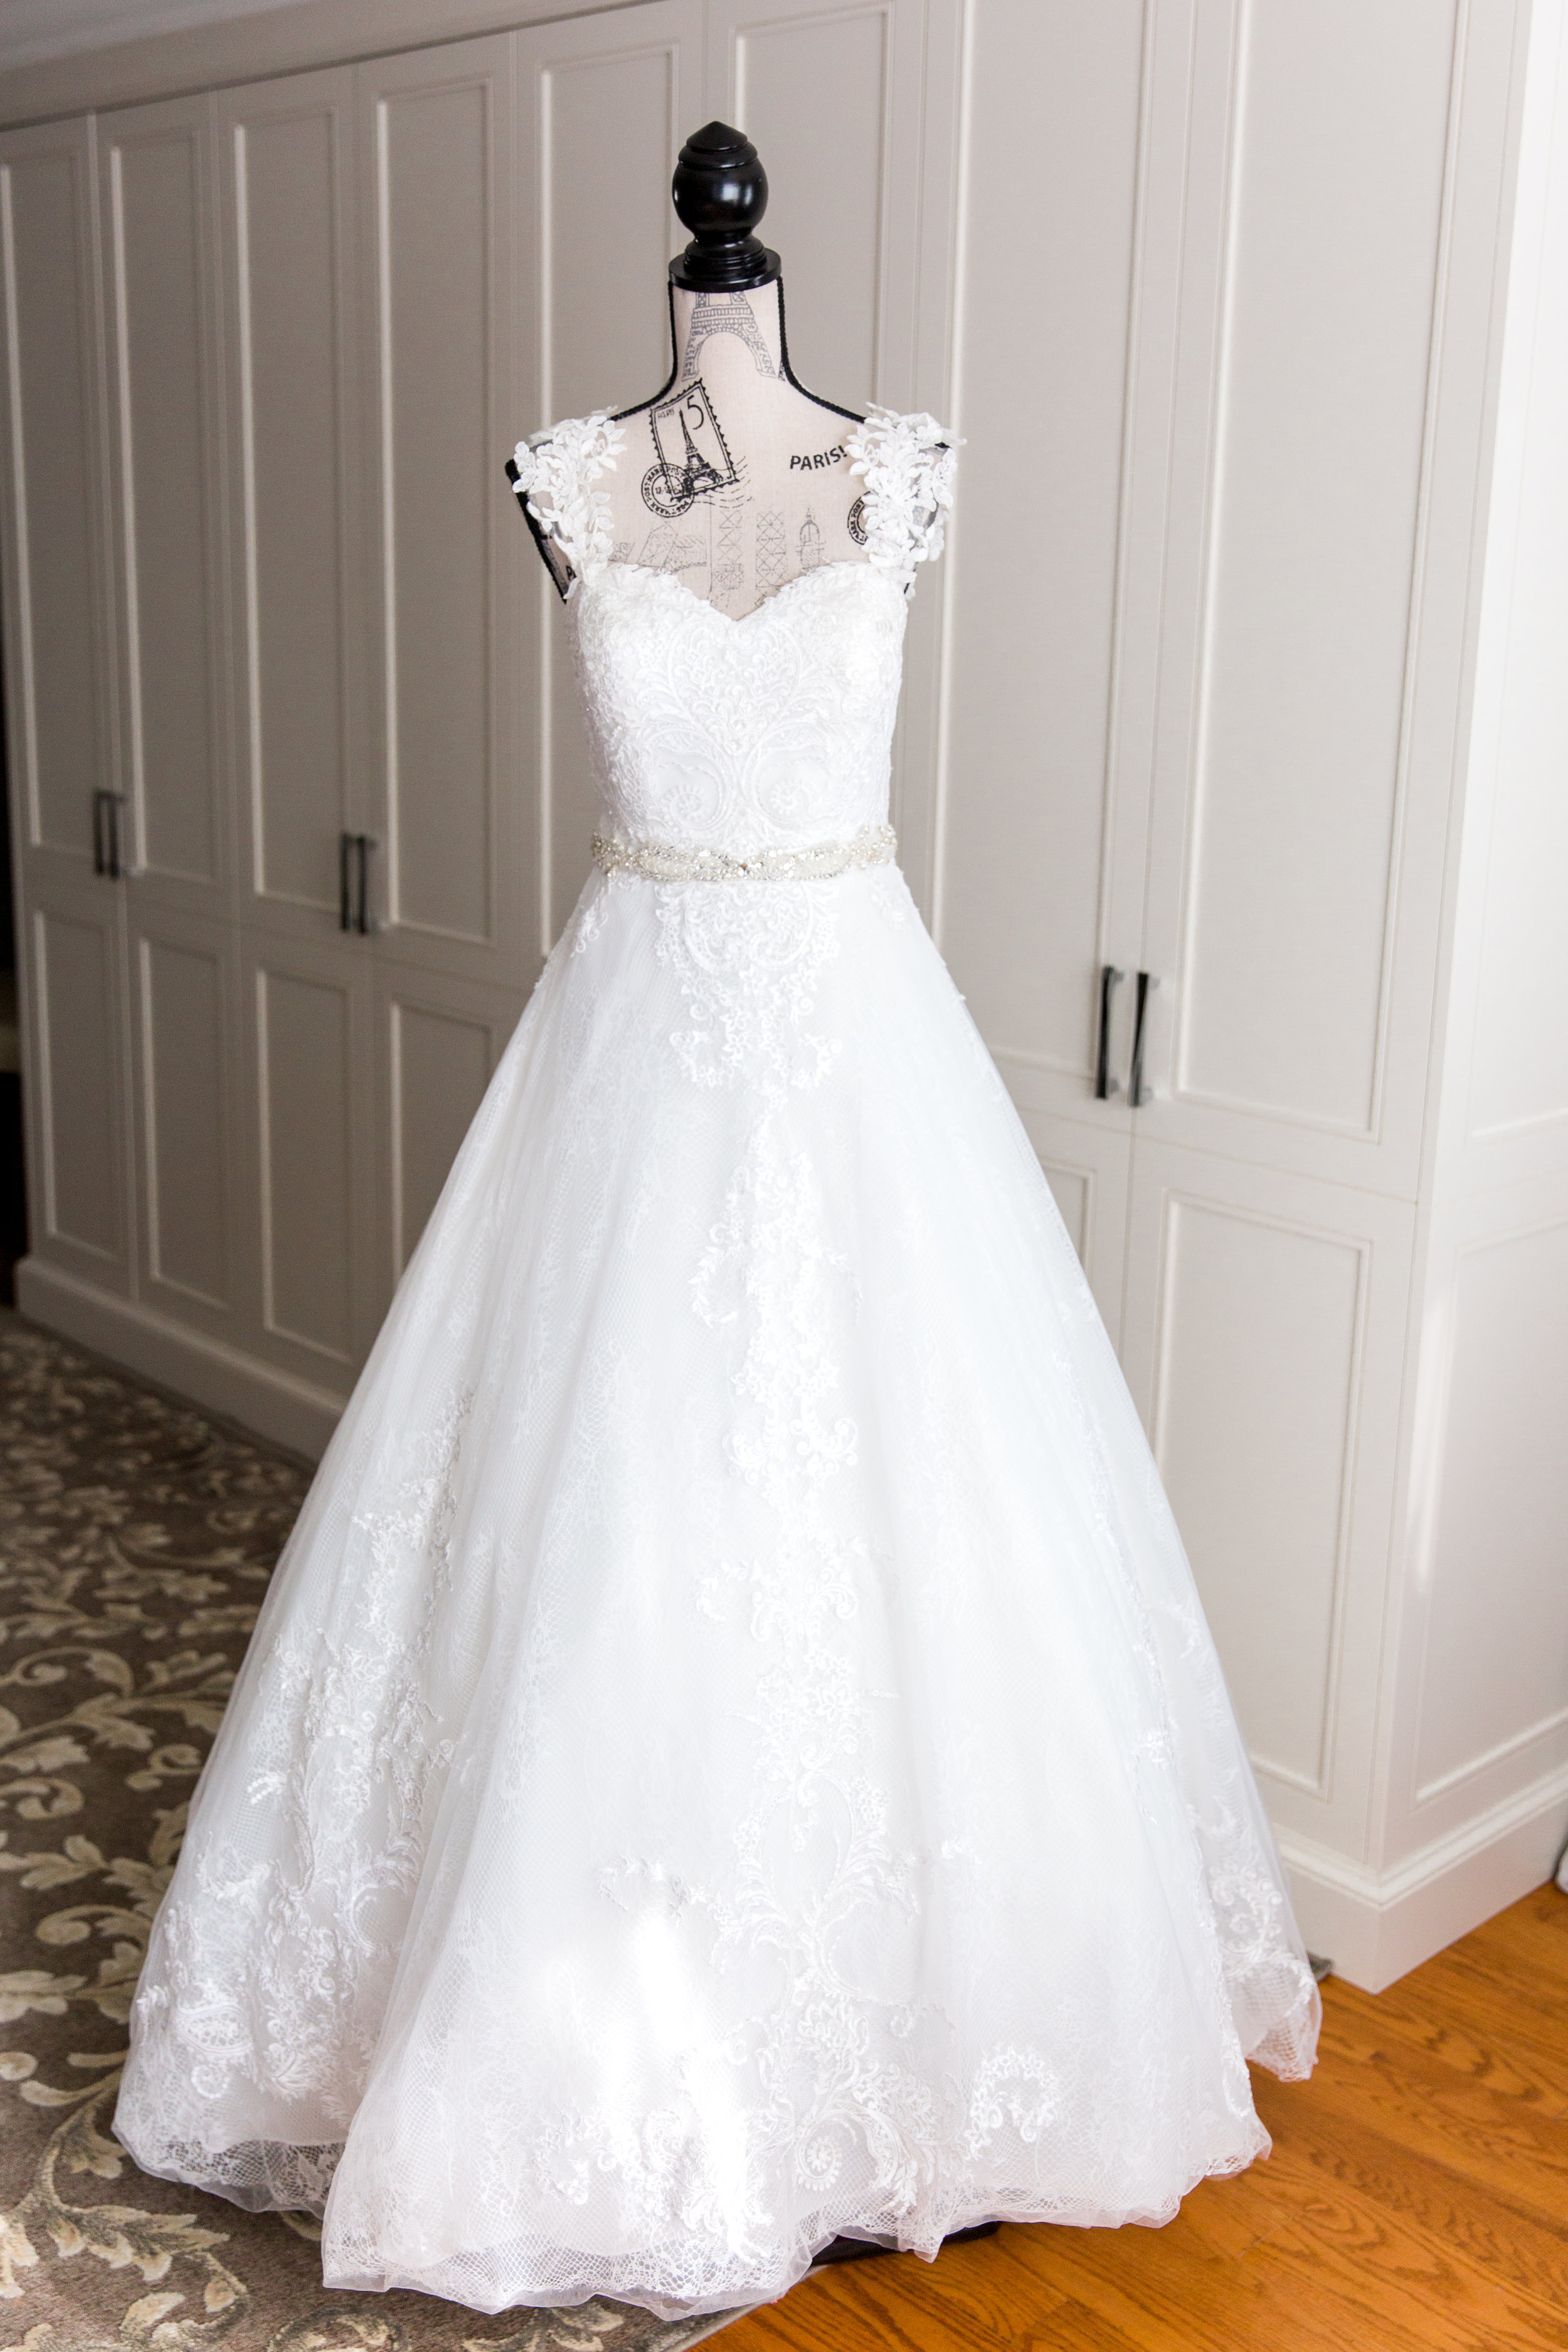 Danielle-Giroux-Amir-Golbazi-Toronto-Wedding-Photographer-Bellvue-Manor_DeLuca_1-055.jpg